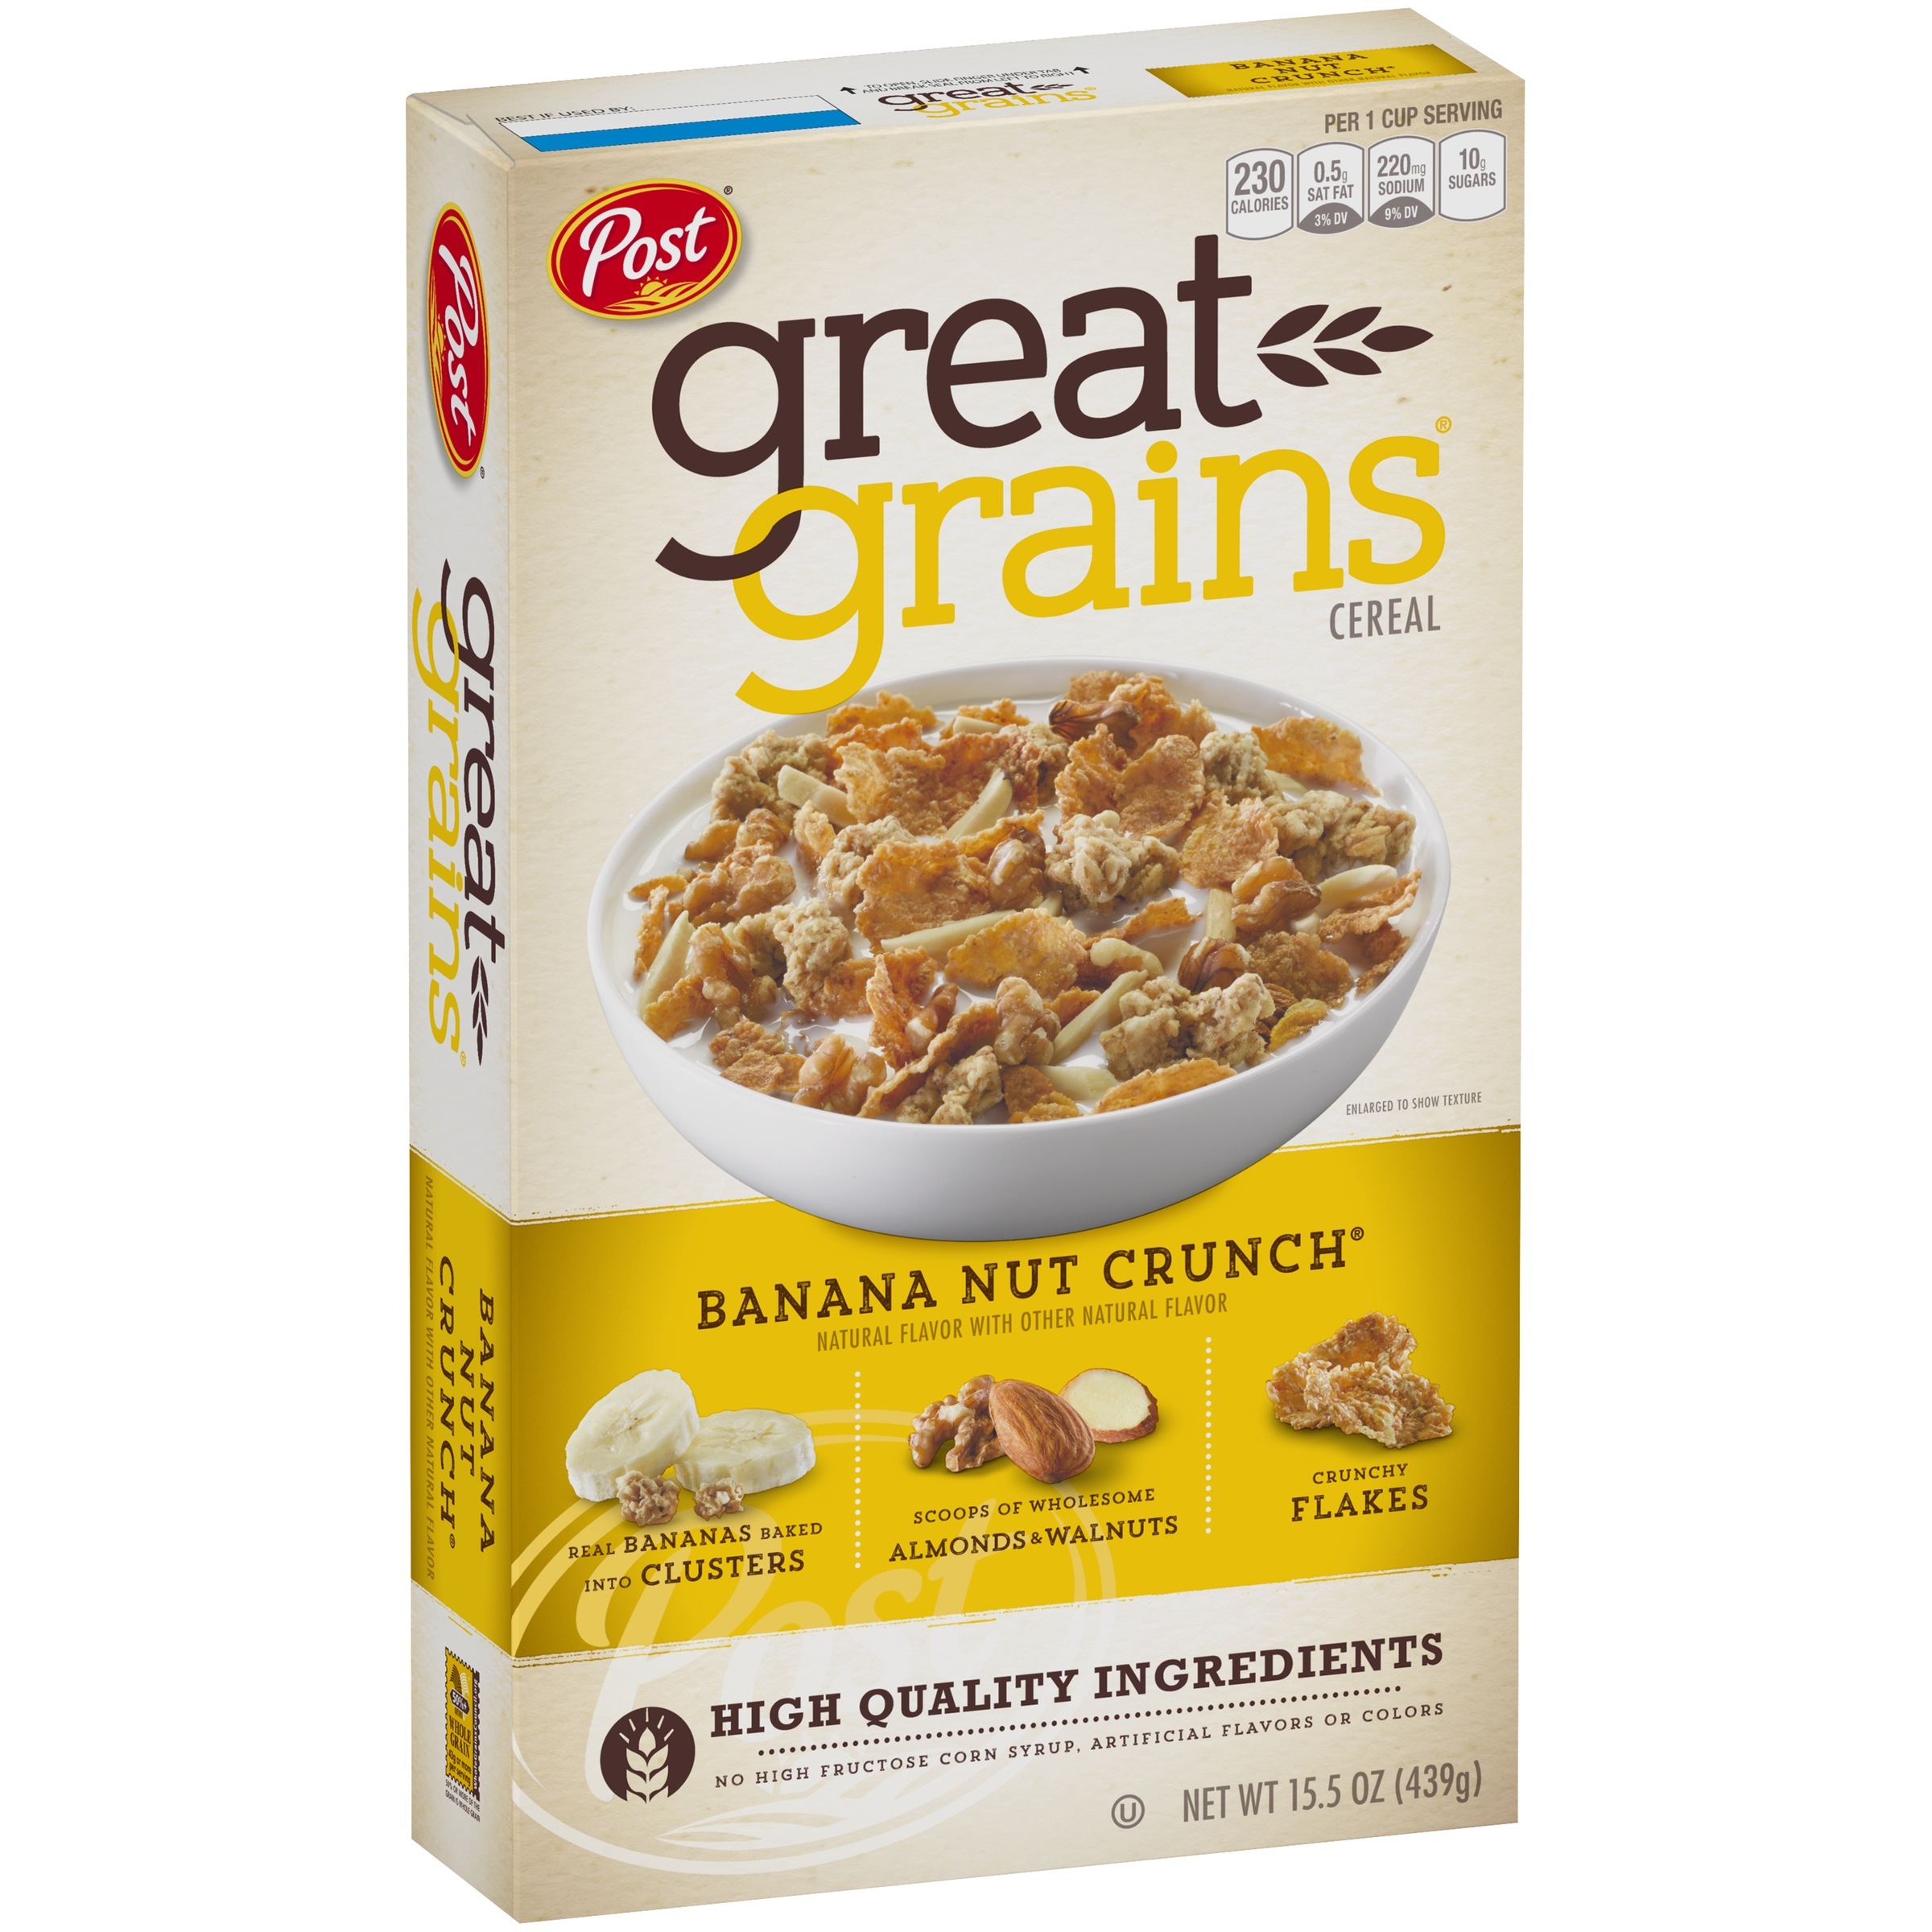 Post Great Grains Breakfast Cereal, Banana Nut Crunch, 15